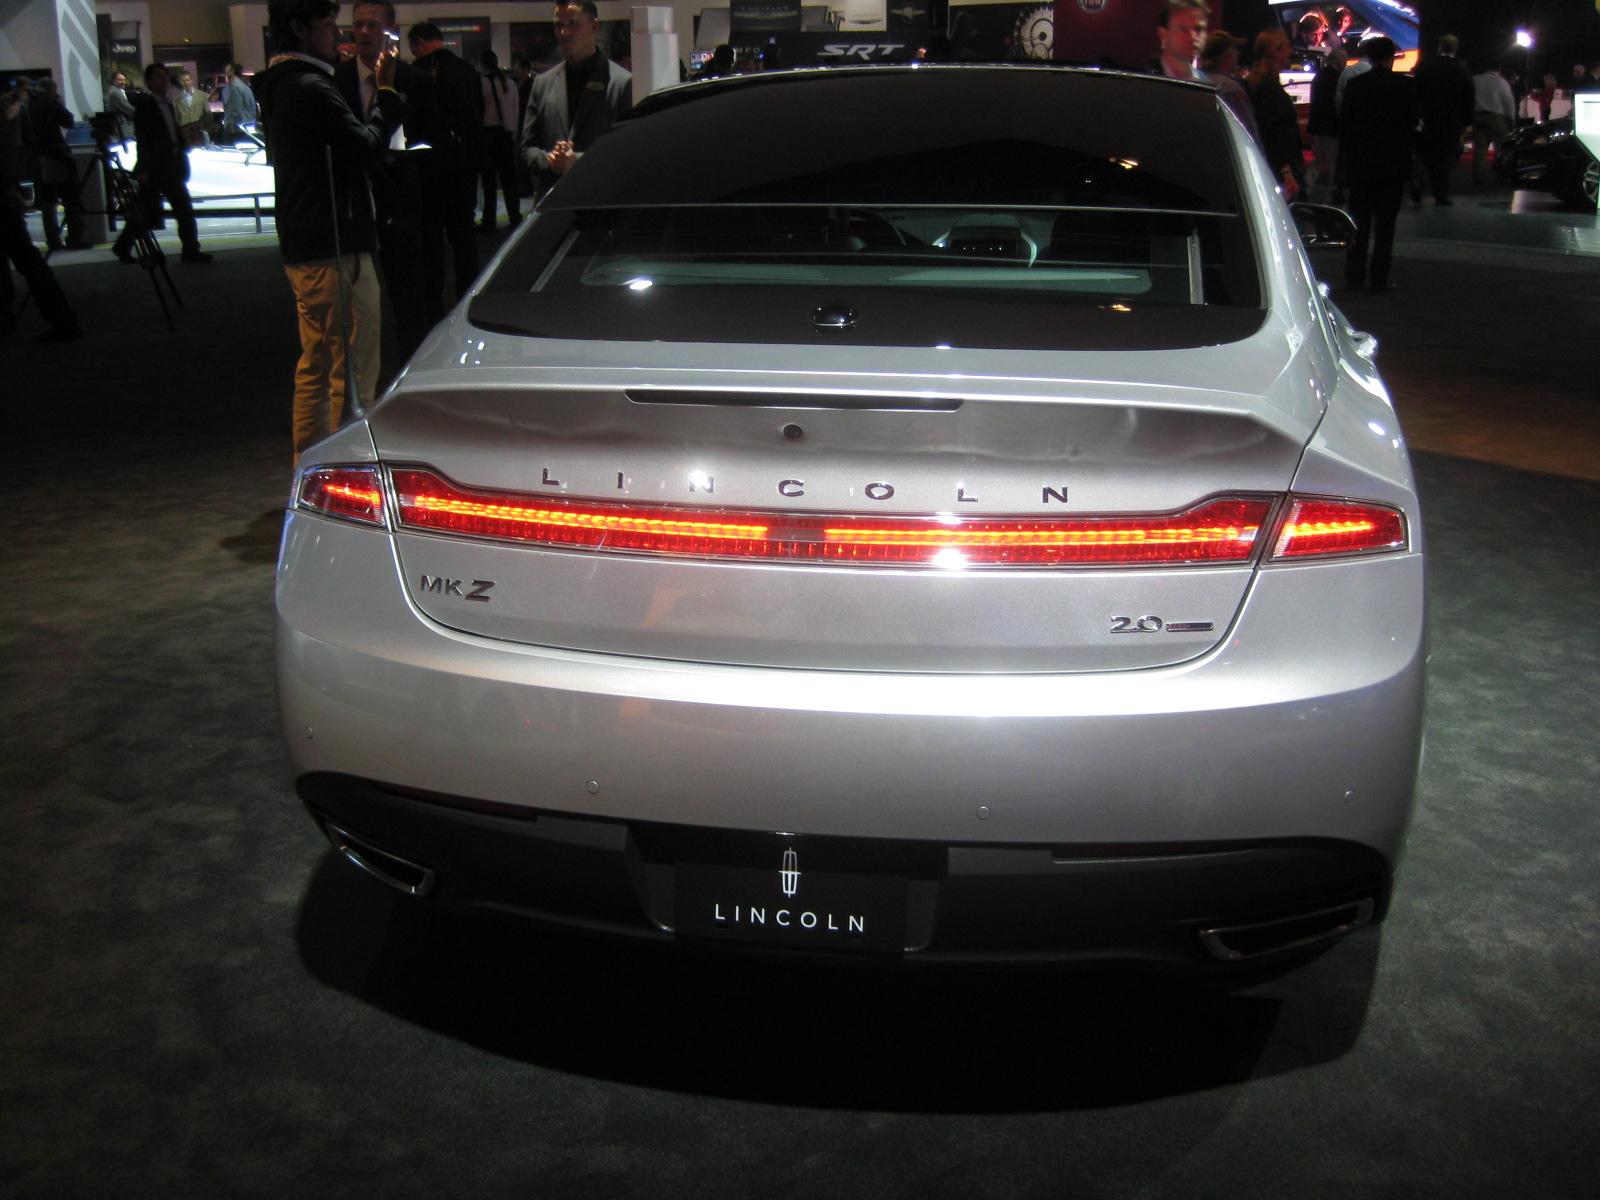 Lincoln 2013 Mkz Rear Todd Bianco S